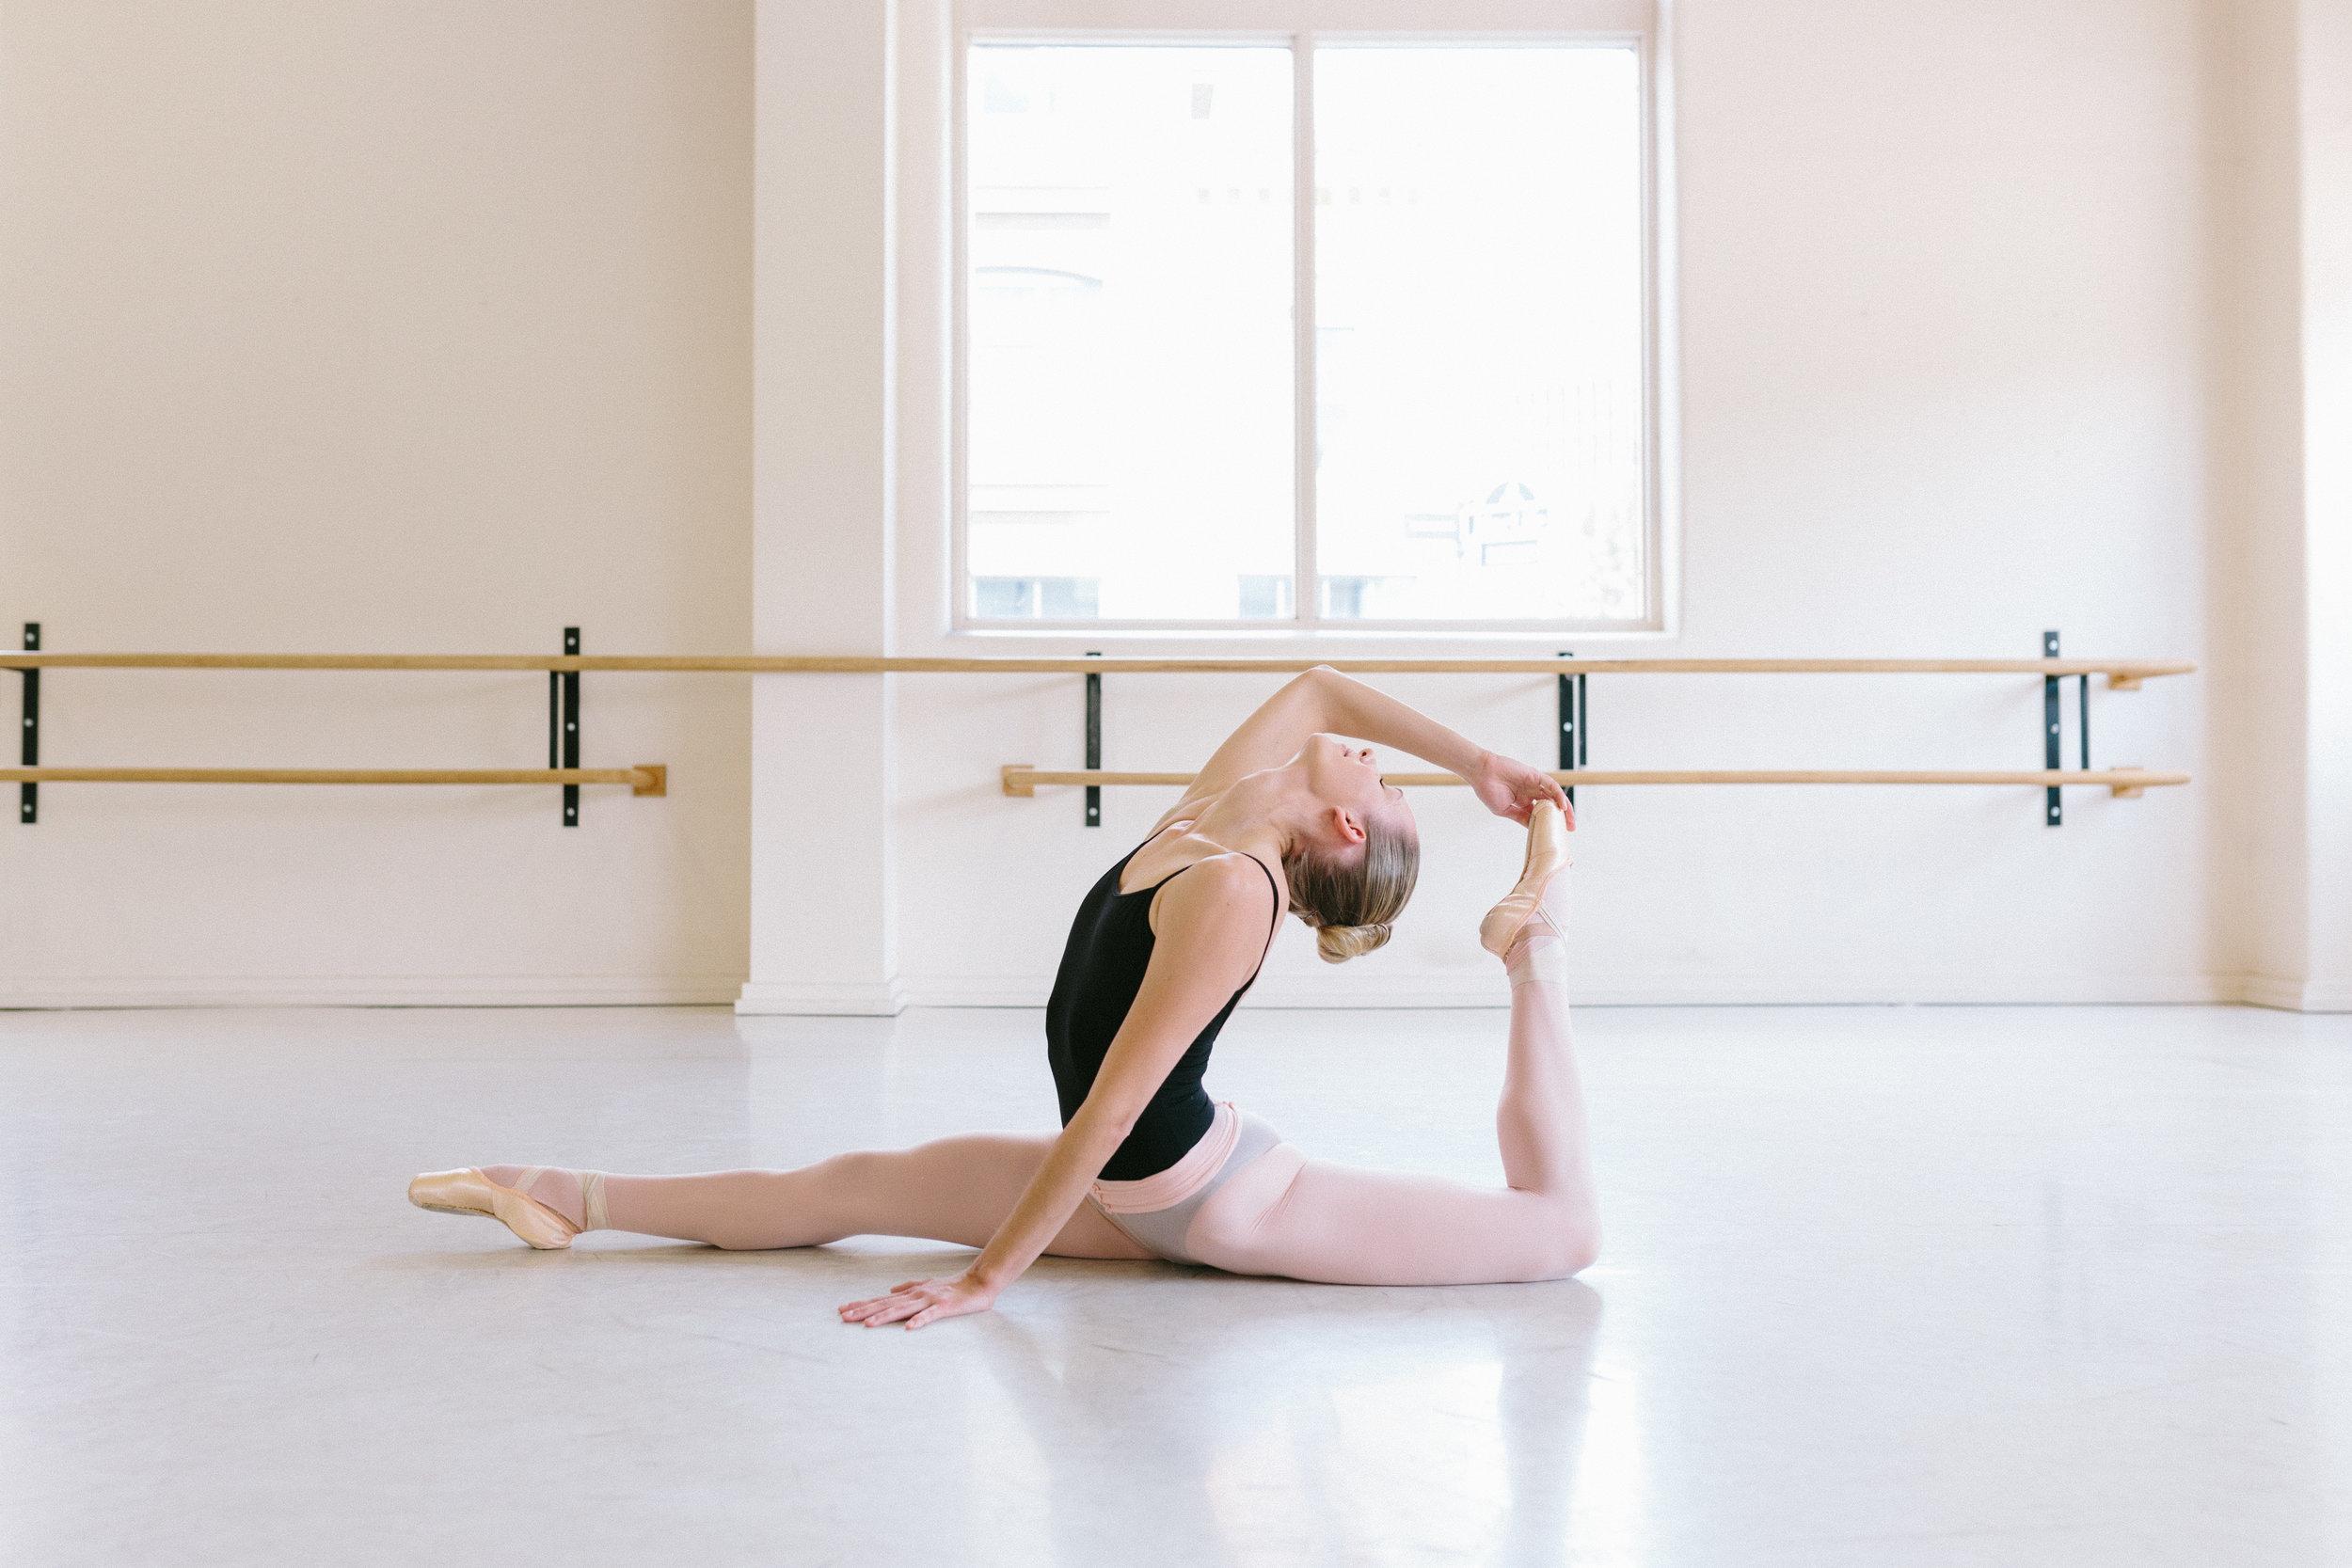 Jessica_Ballet-14.JPG